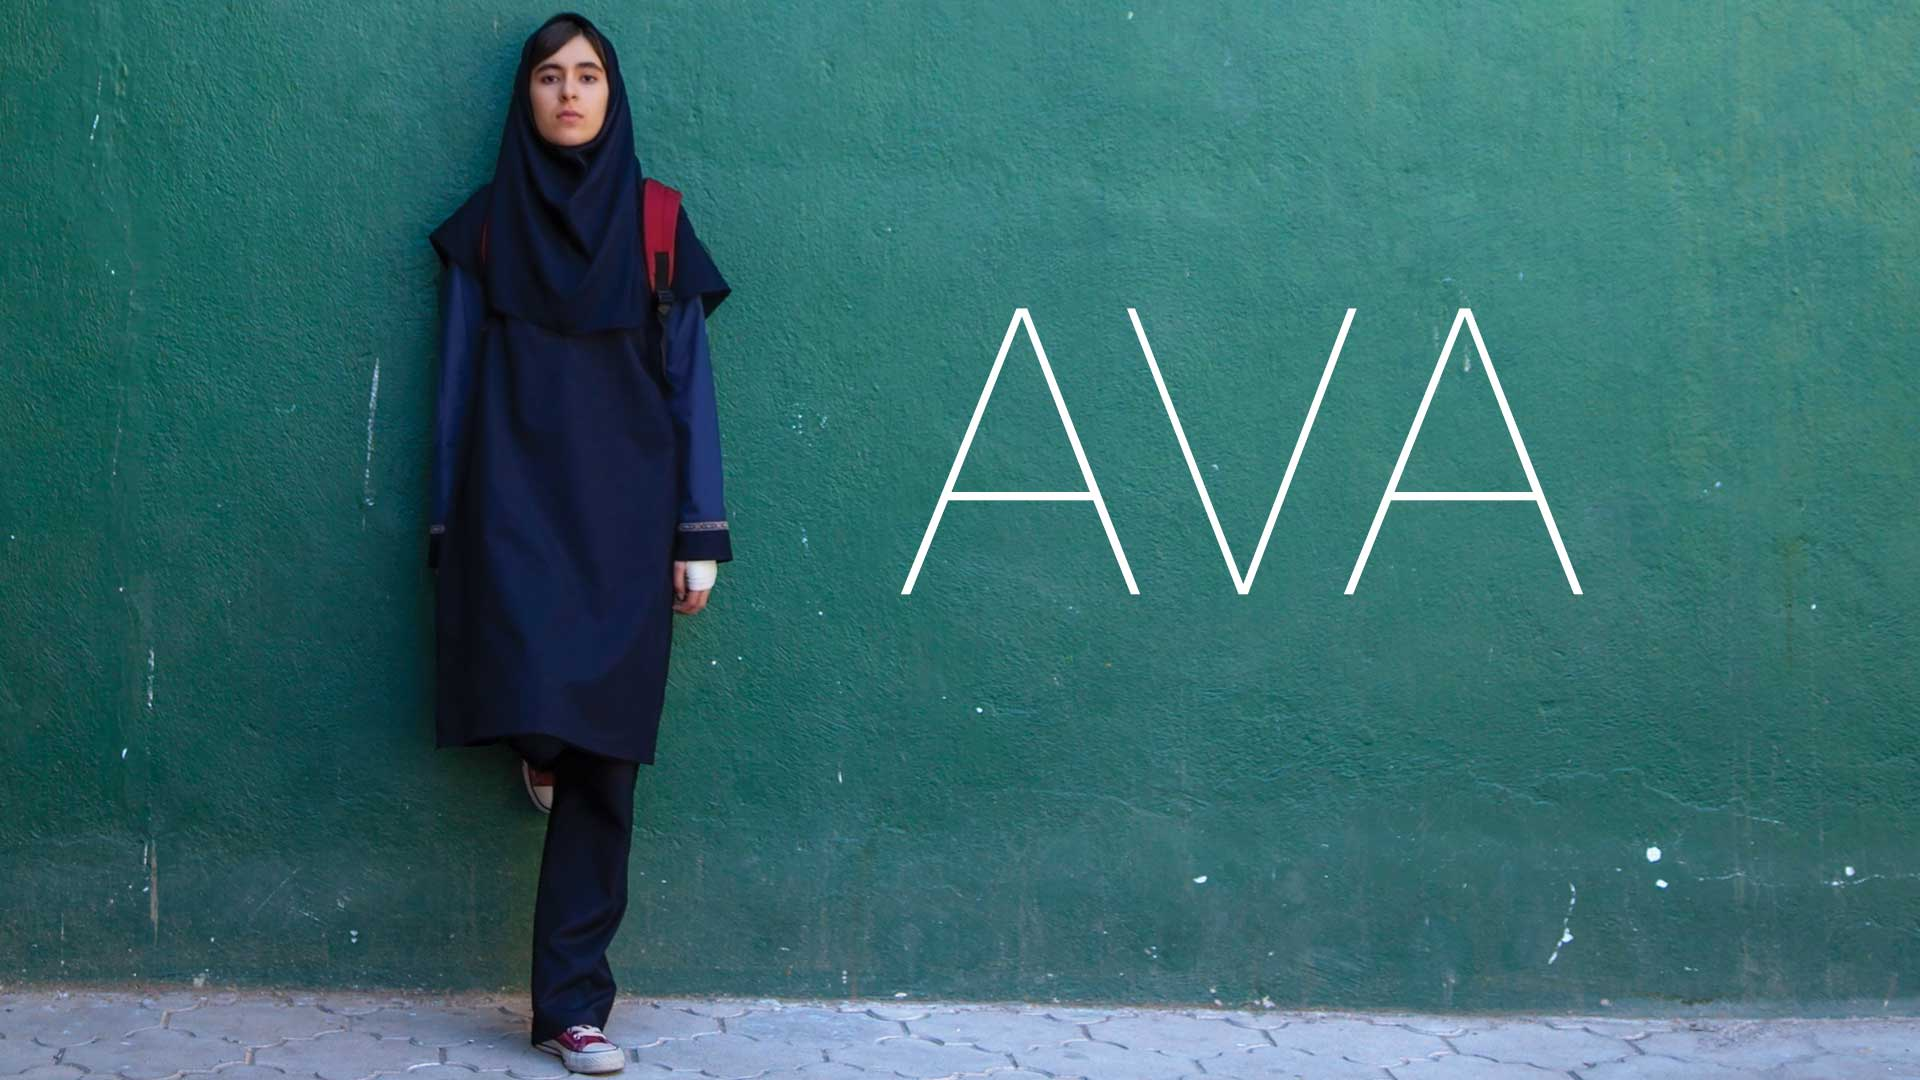 Ava - image